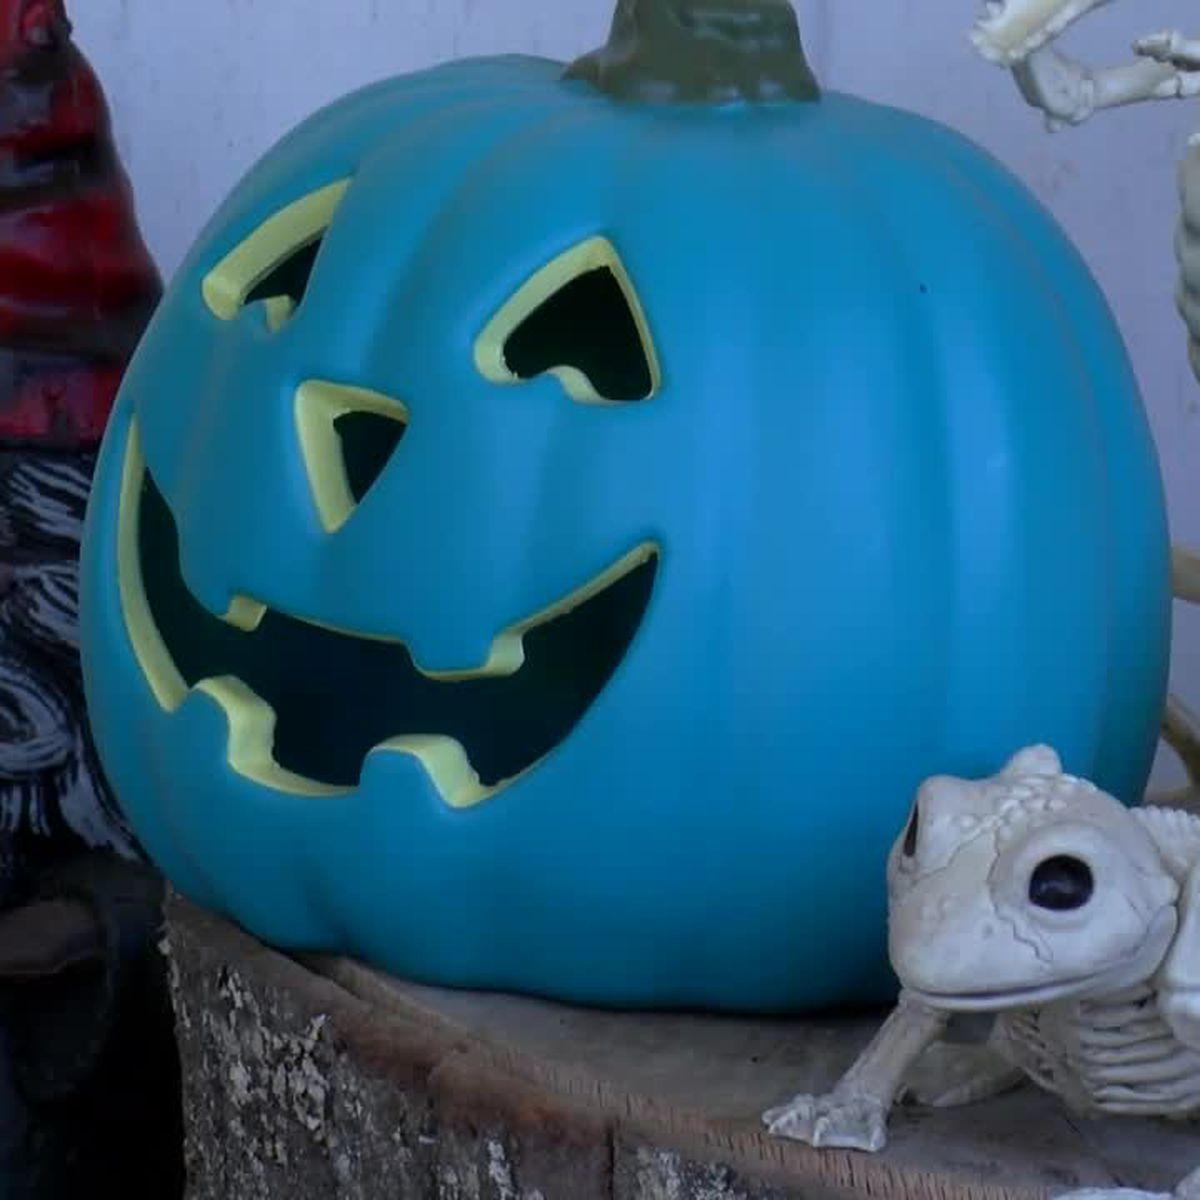 WEBXTRA: Teal Pumpkin Project helps parents find homes with allergen-safe Halloween treats